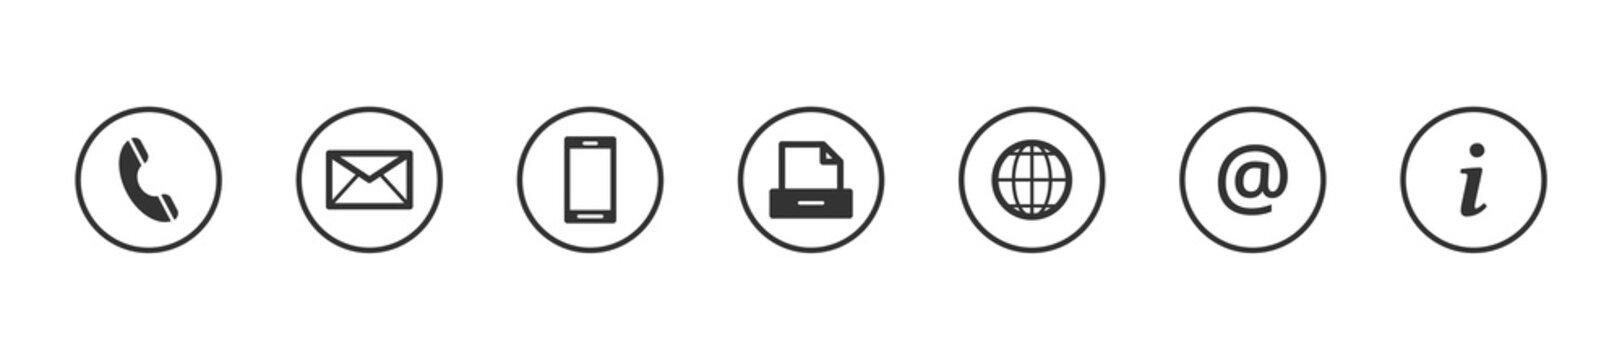 Kontakt Icons Buttons Grau